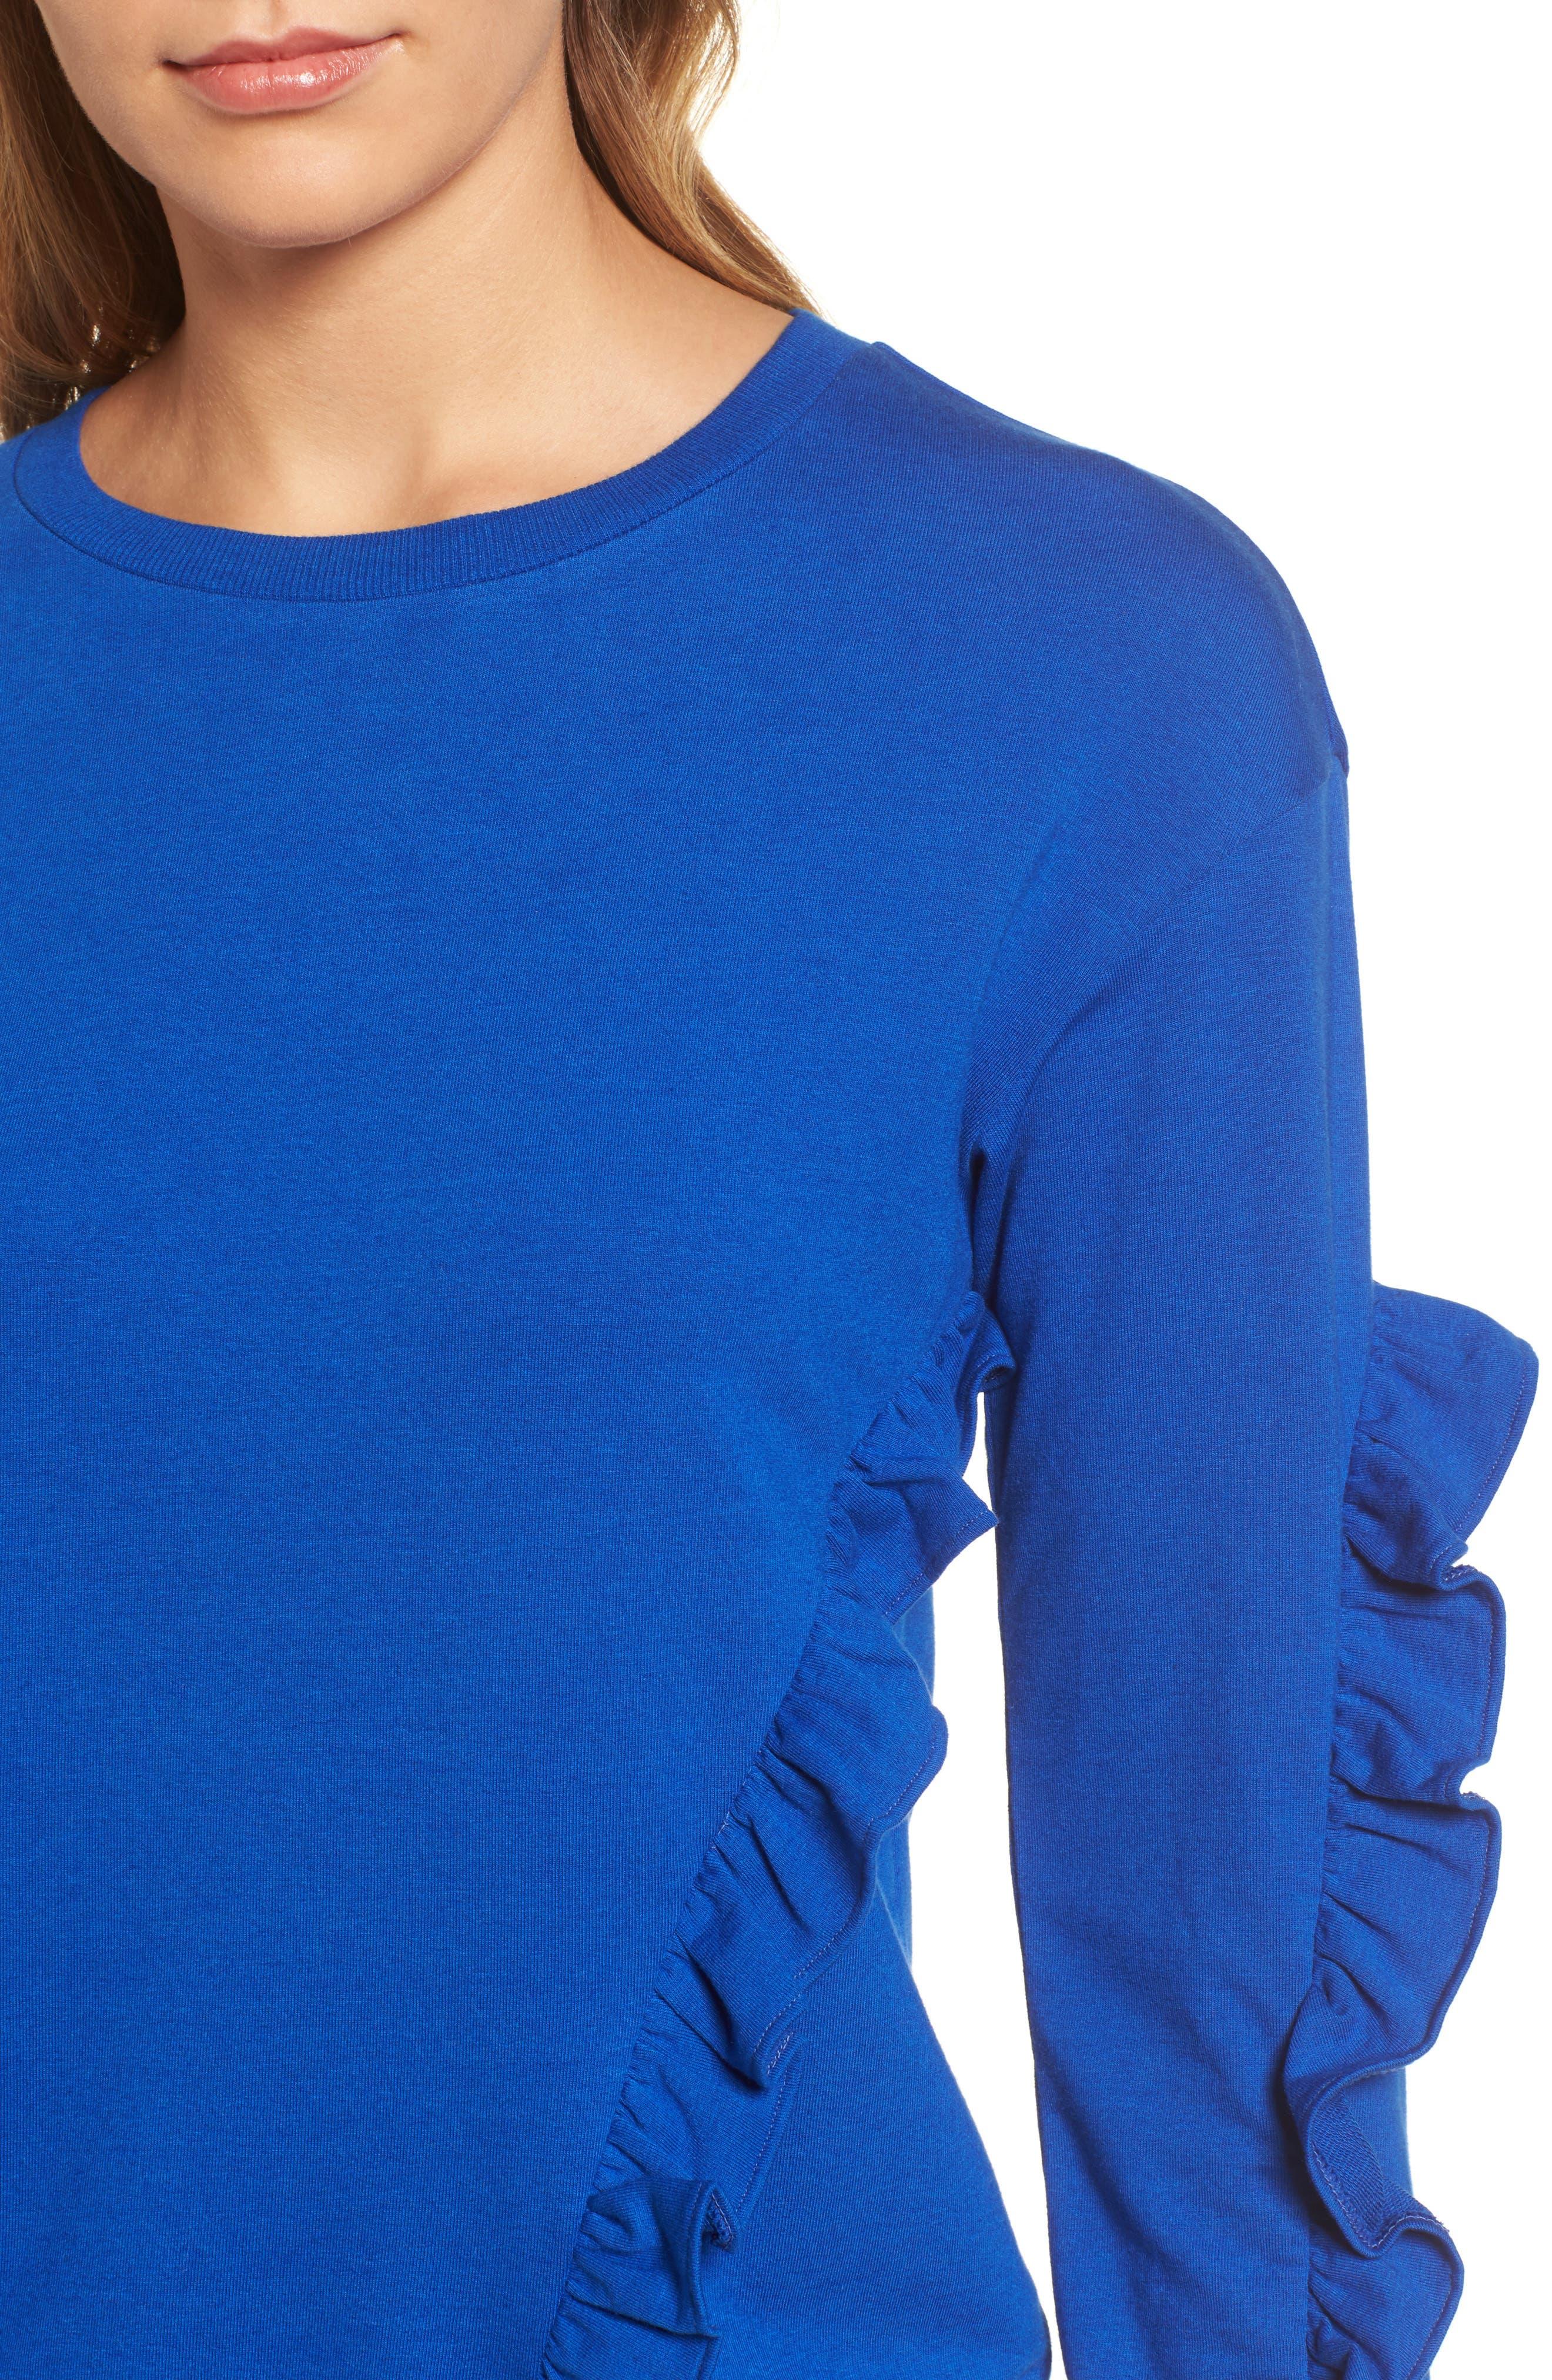 Ruffle Detail Sweatshirt,                             Alternate thumbnail 4, color,                             Blue Surf